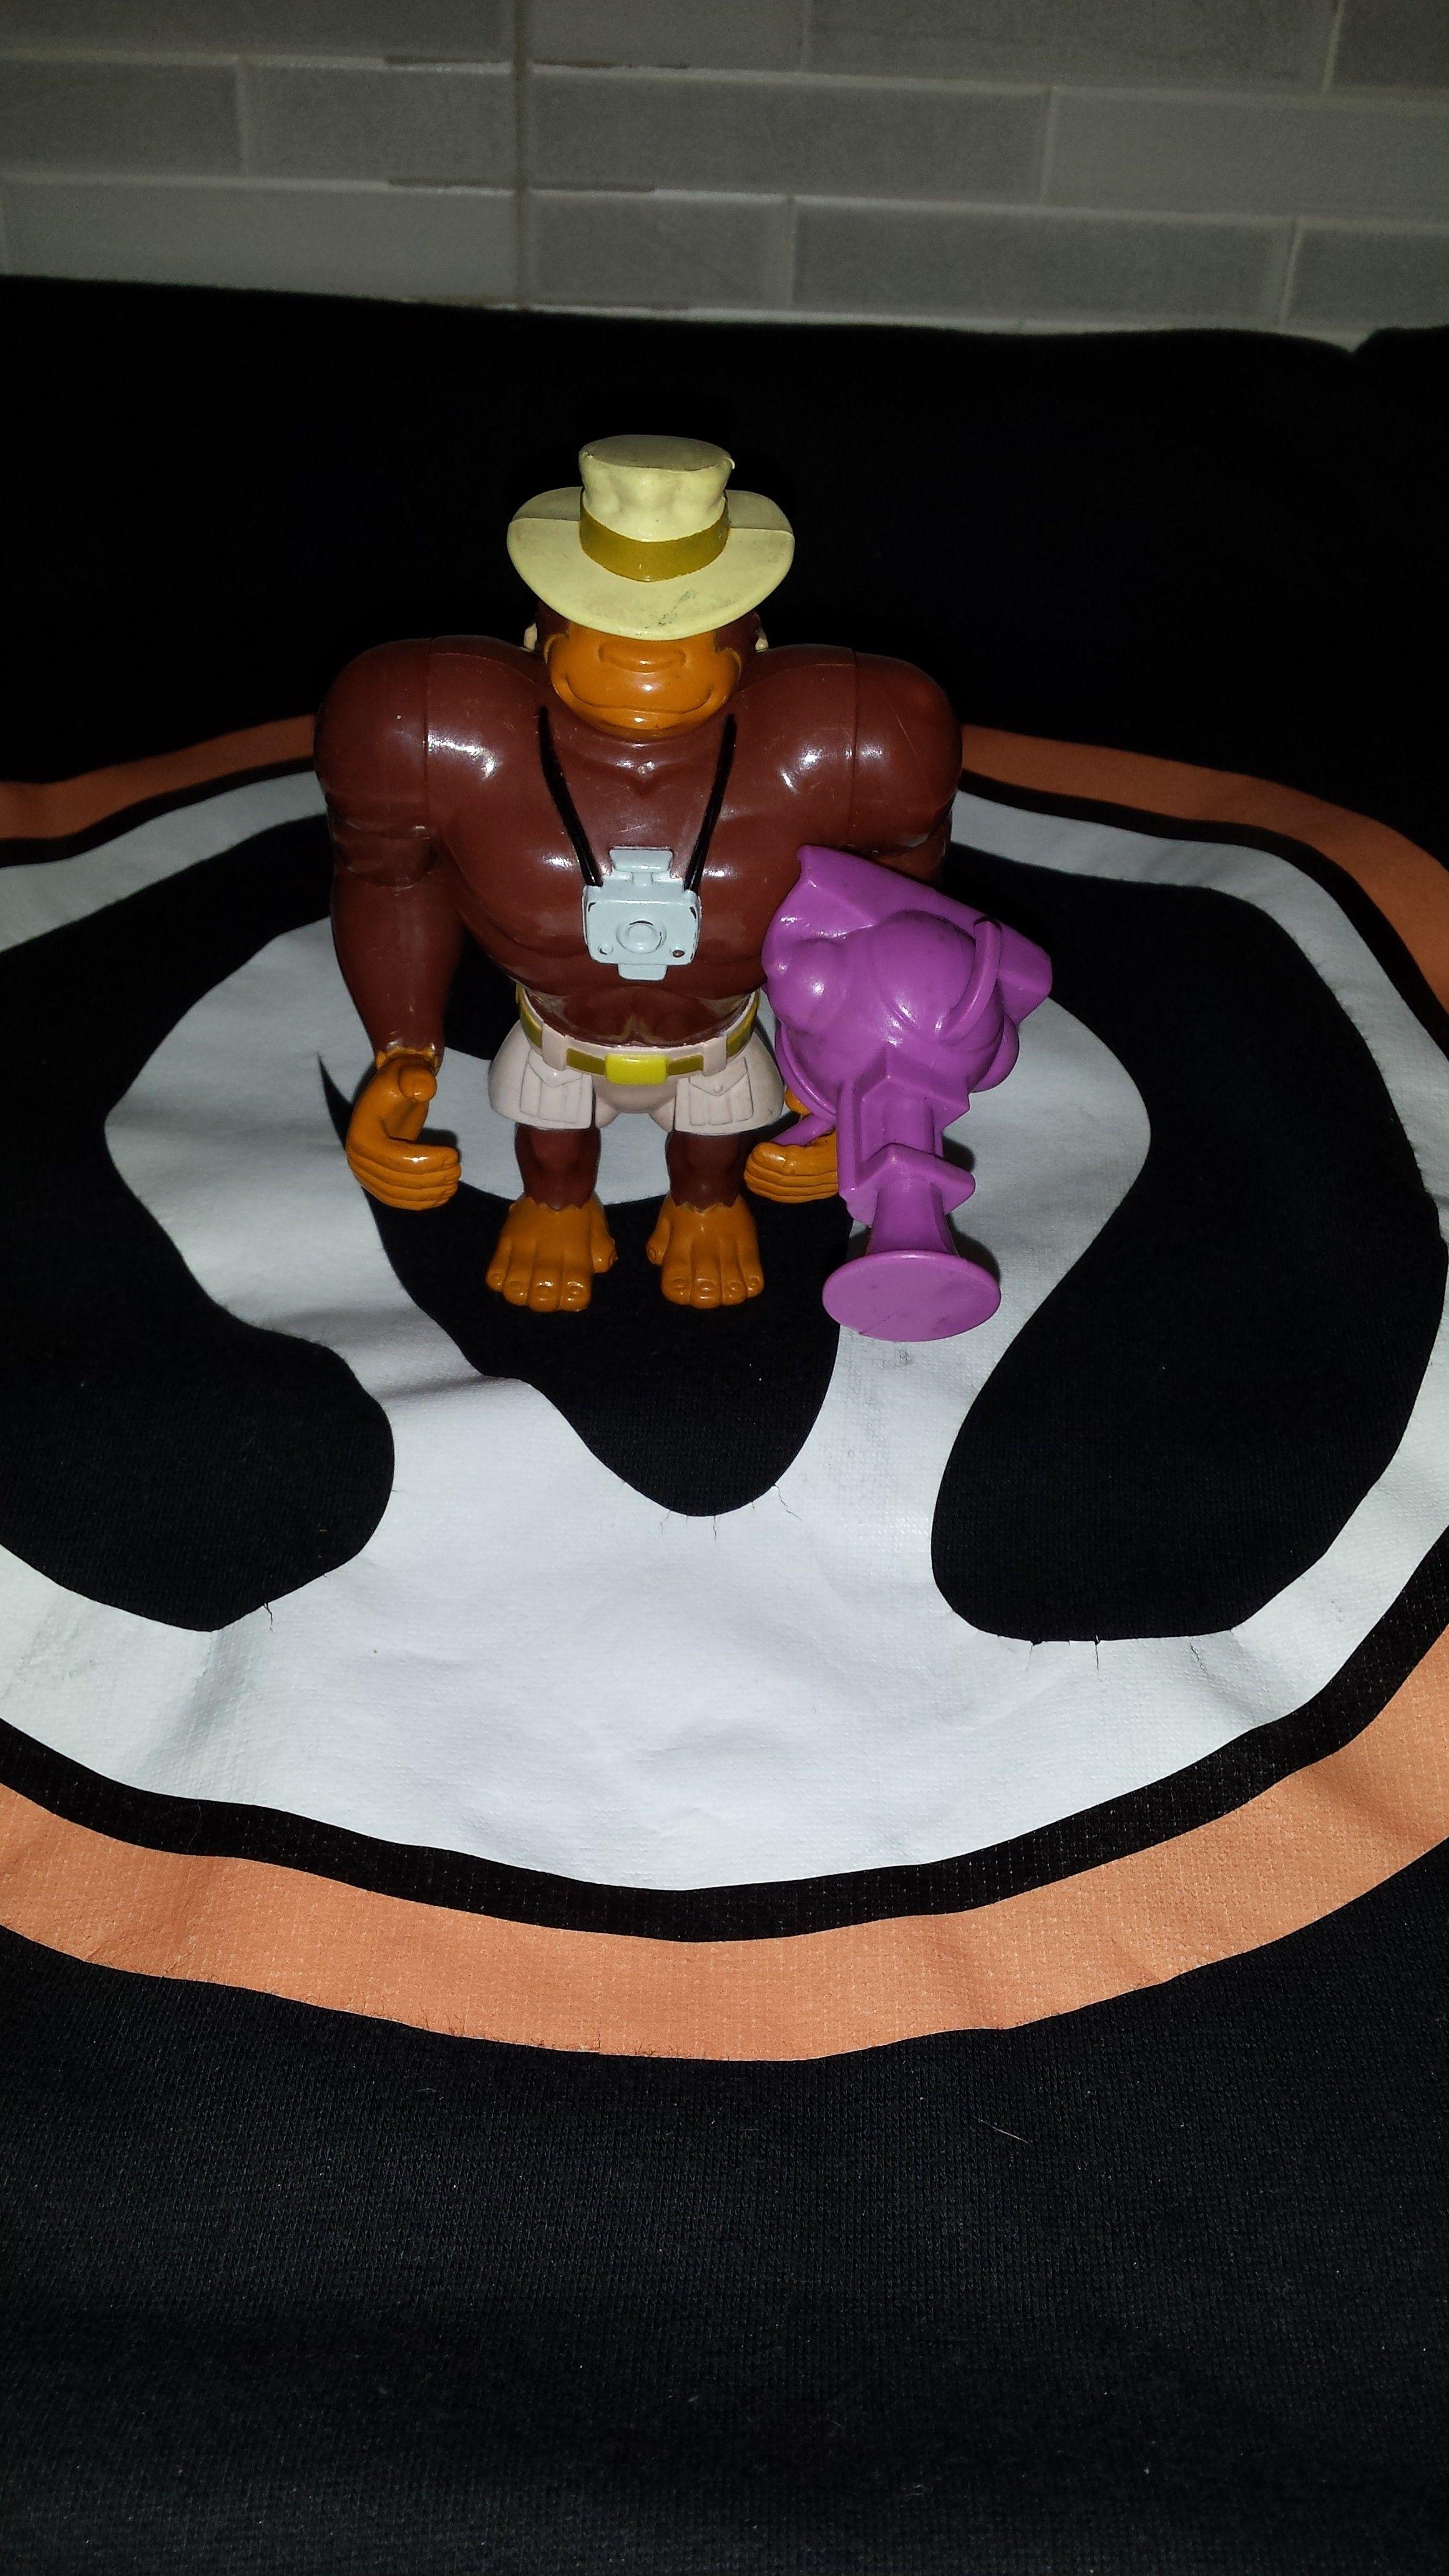 Grunt giocattolo dei Ghostbusters Filmation